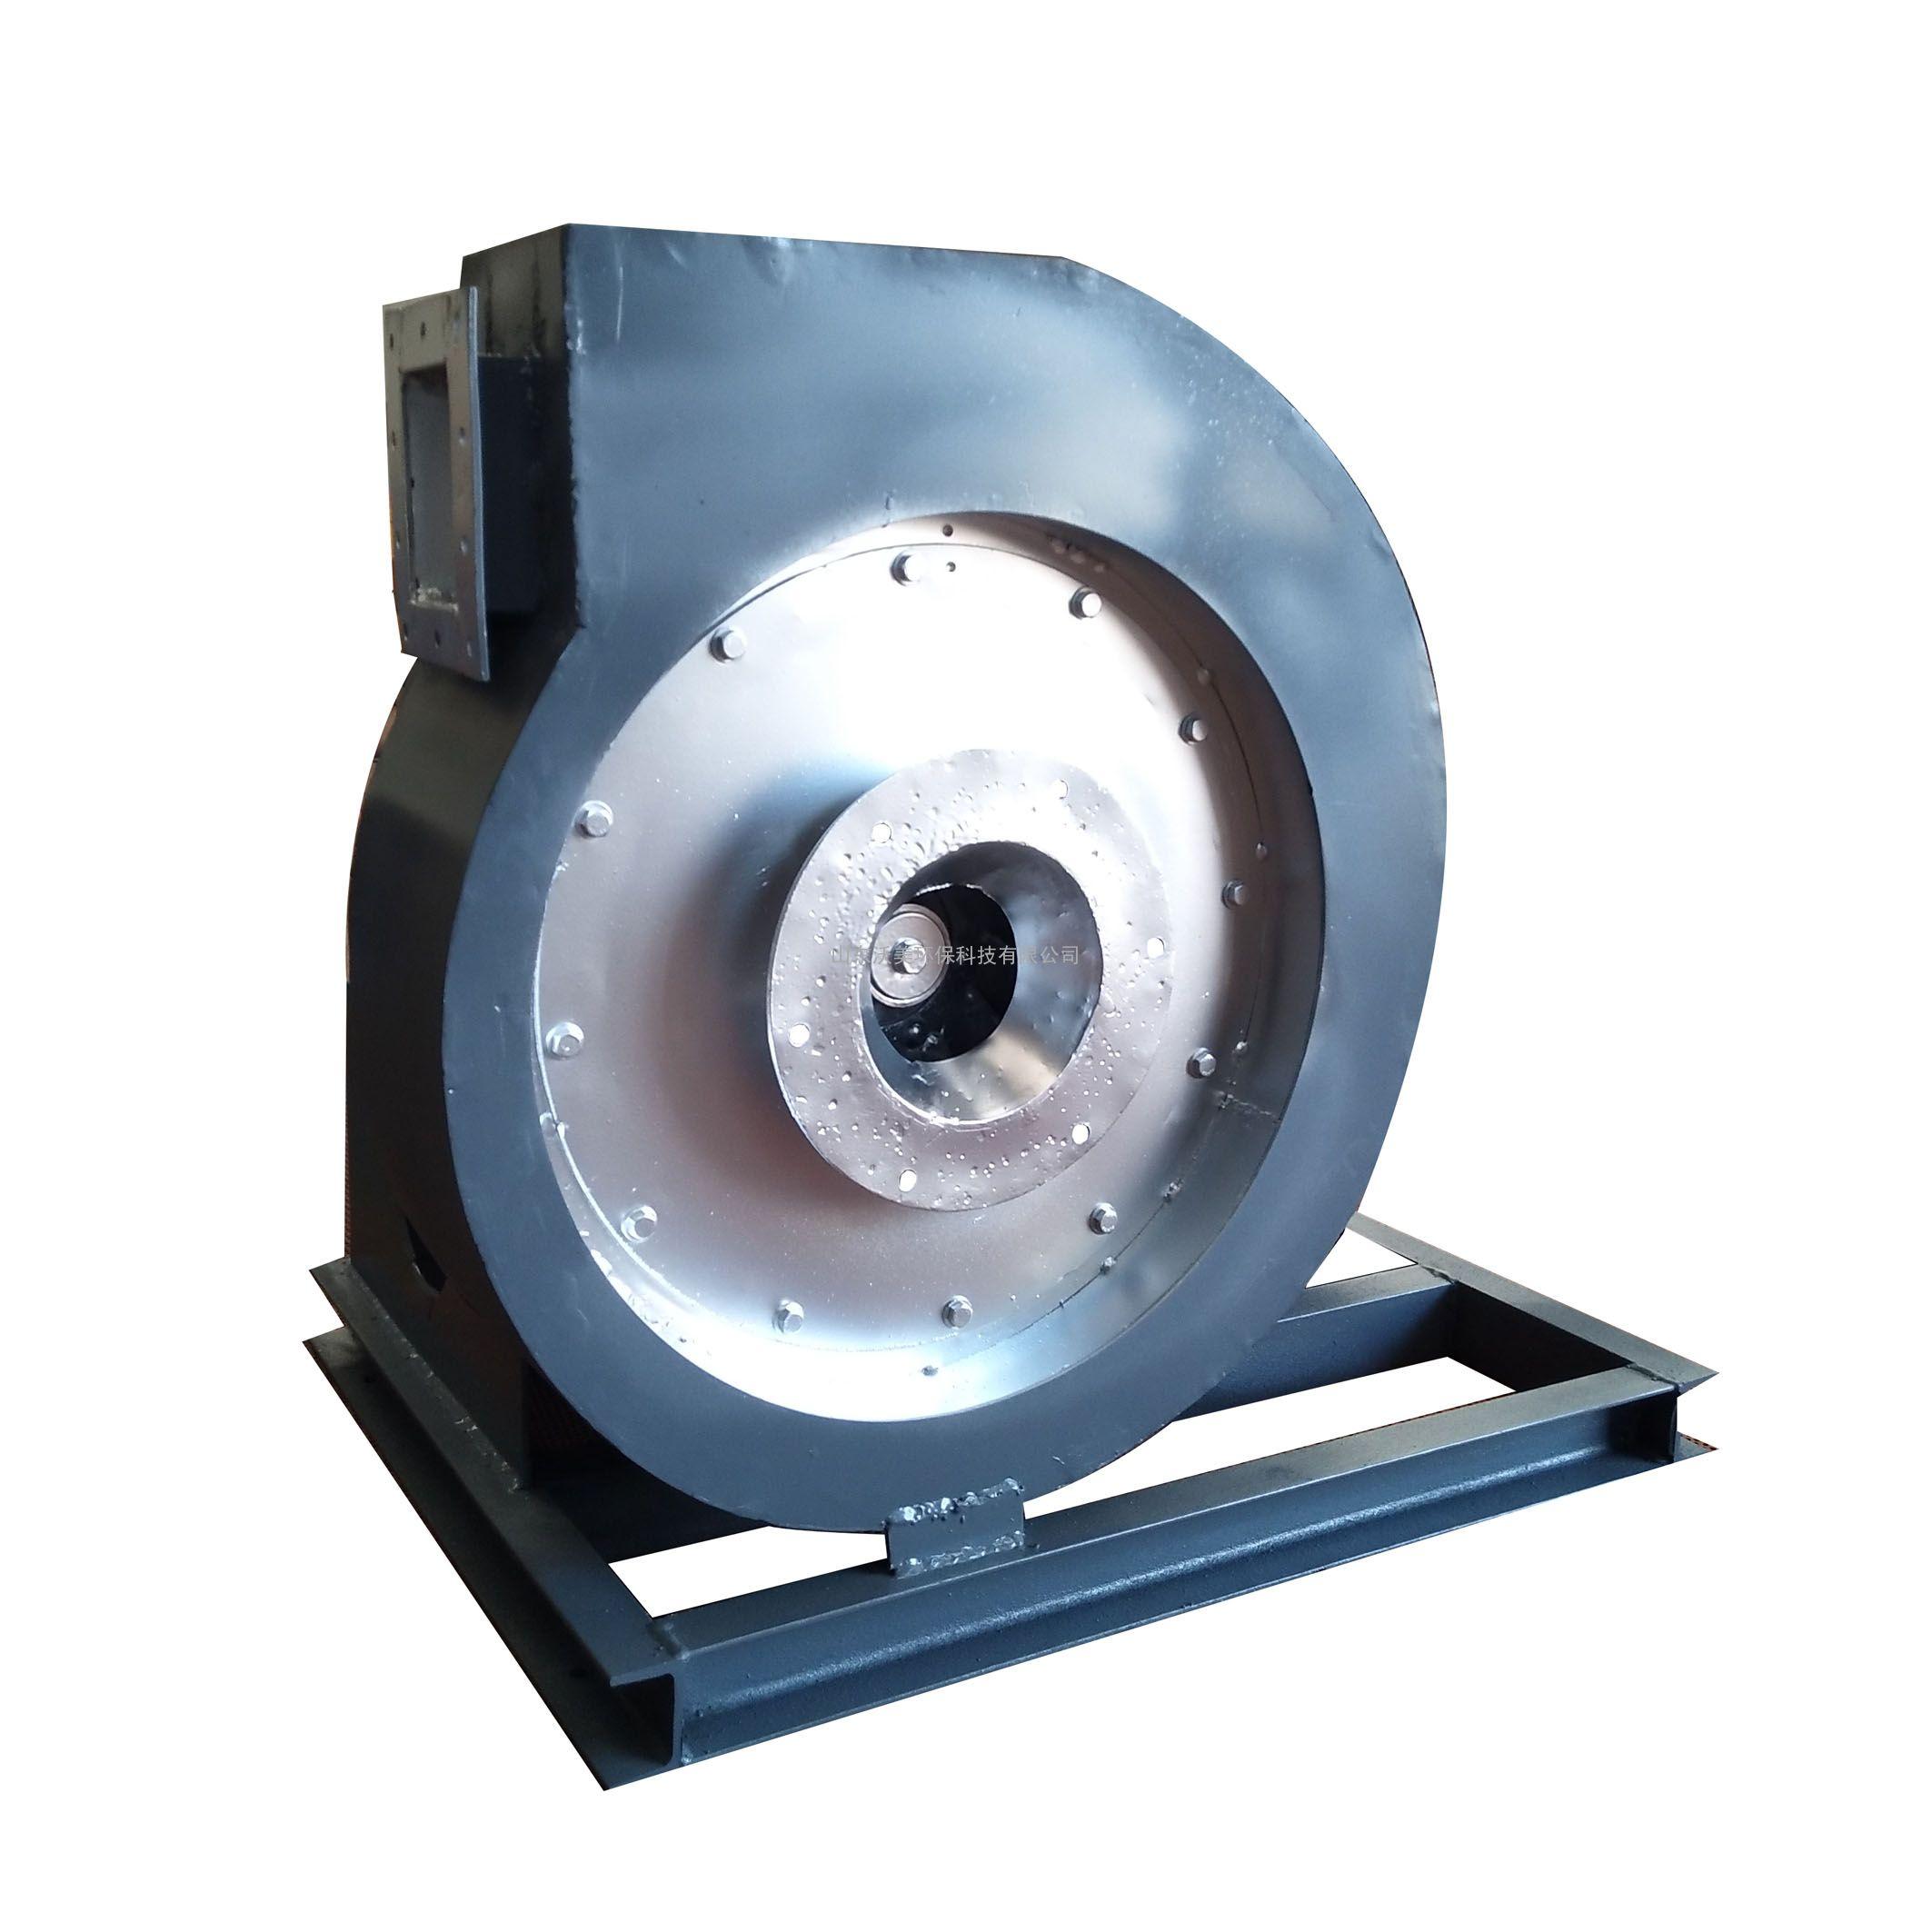 W4-72高温风机|不锈钢风机耐500℃高温|带保温